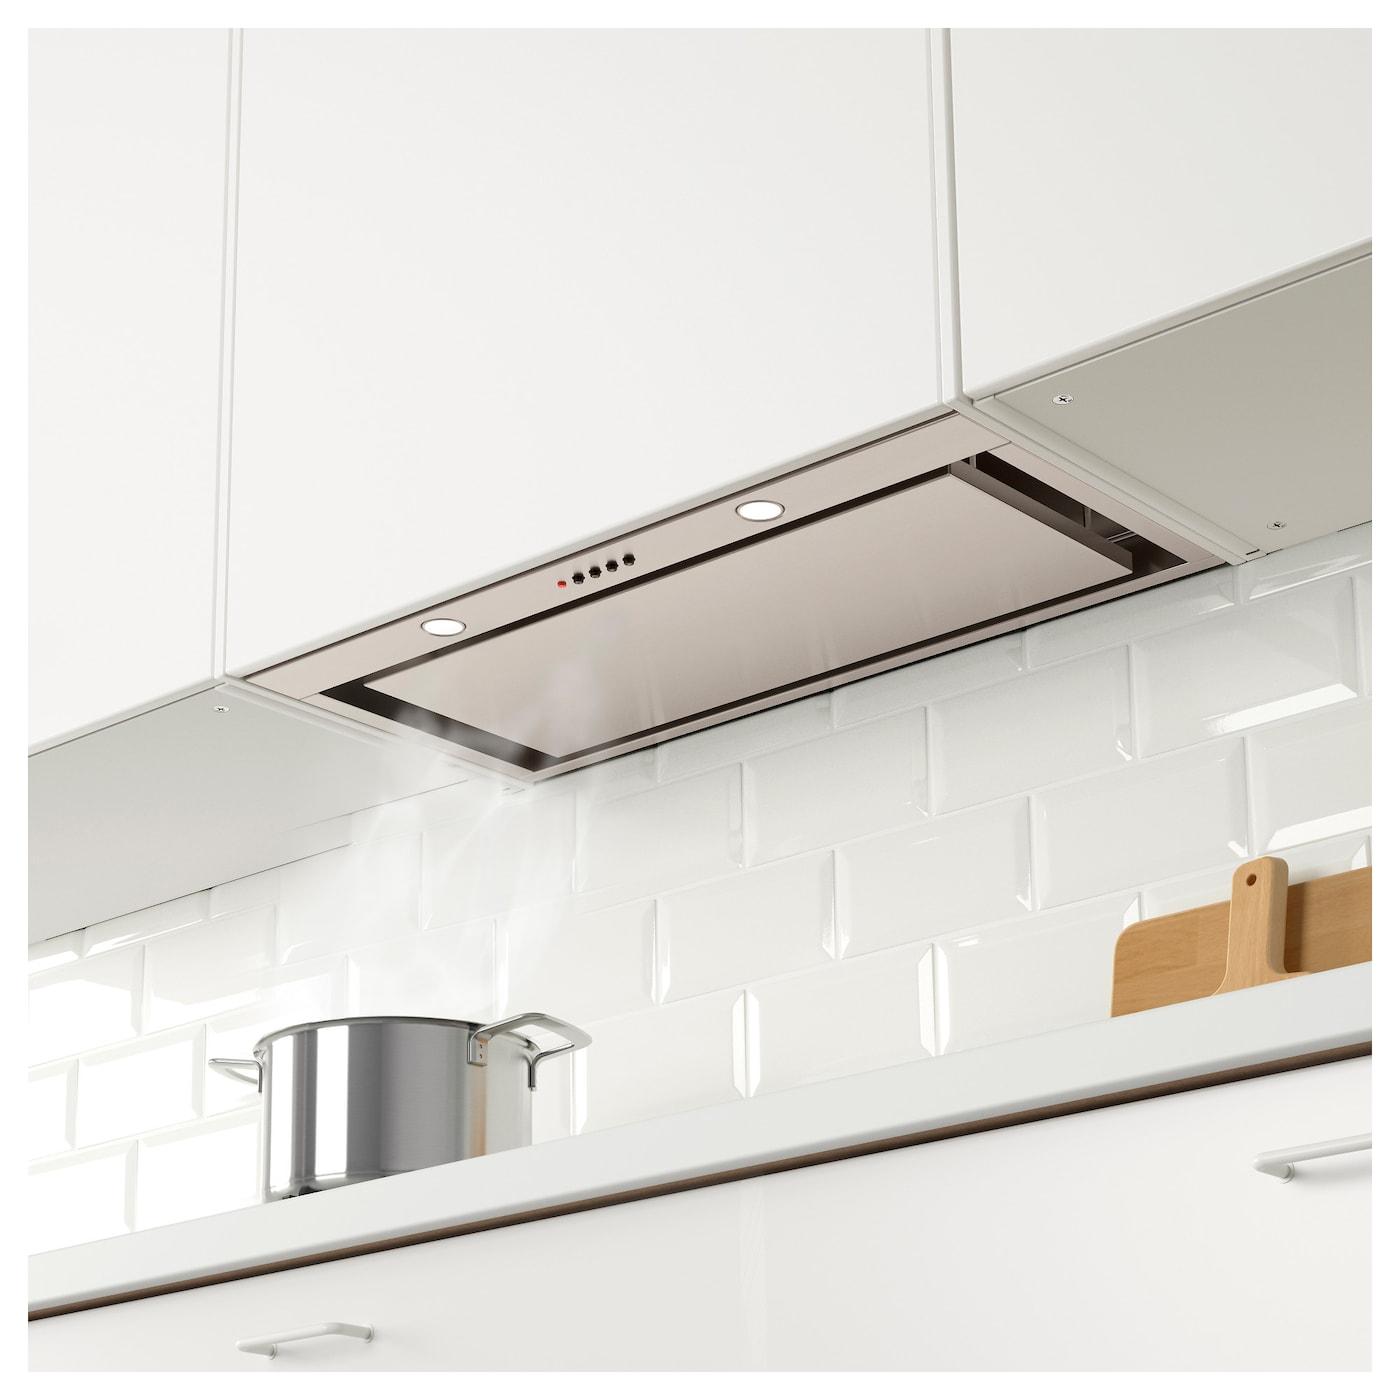 Underverk built in extractor hood stainless steel 76 cm ikea for Ikea kitchen hood